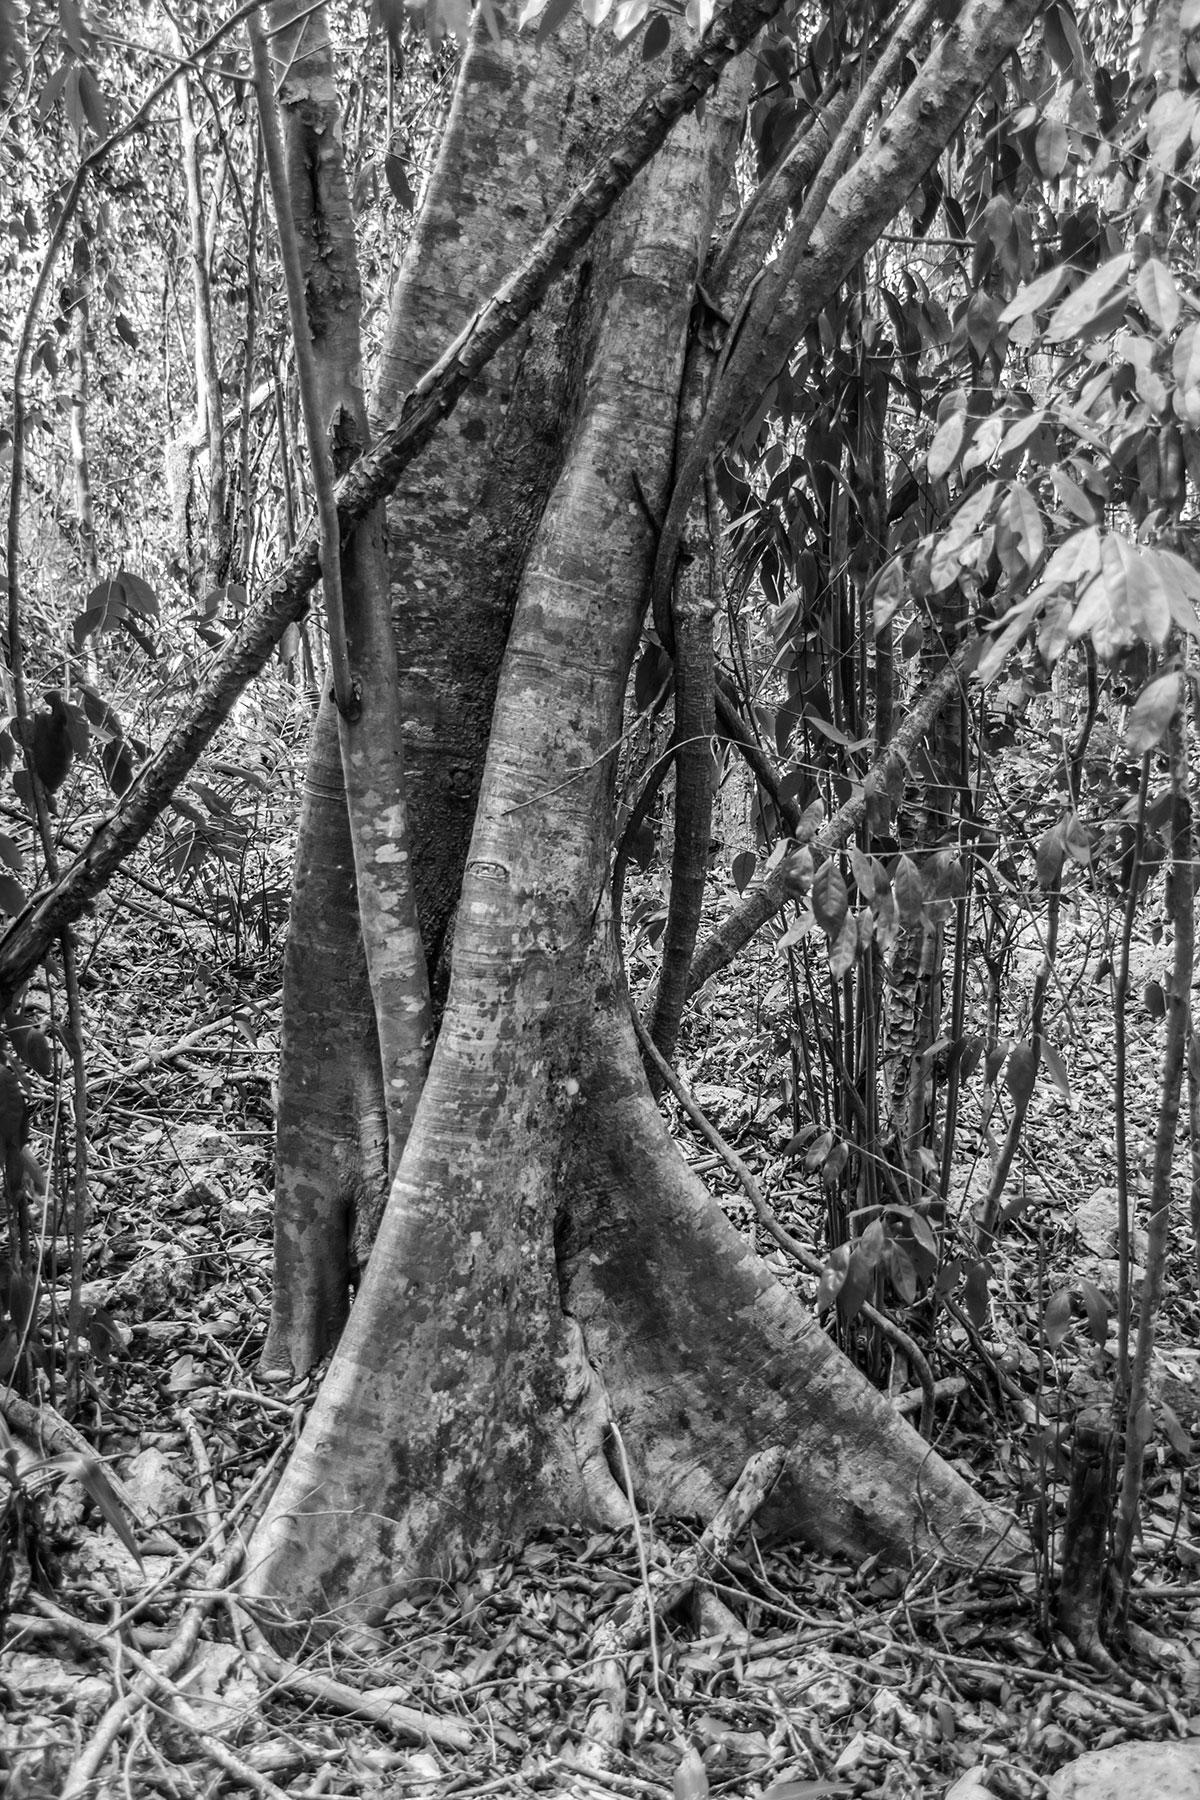 Dominikanische Republik, Baum